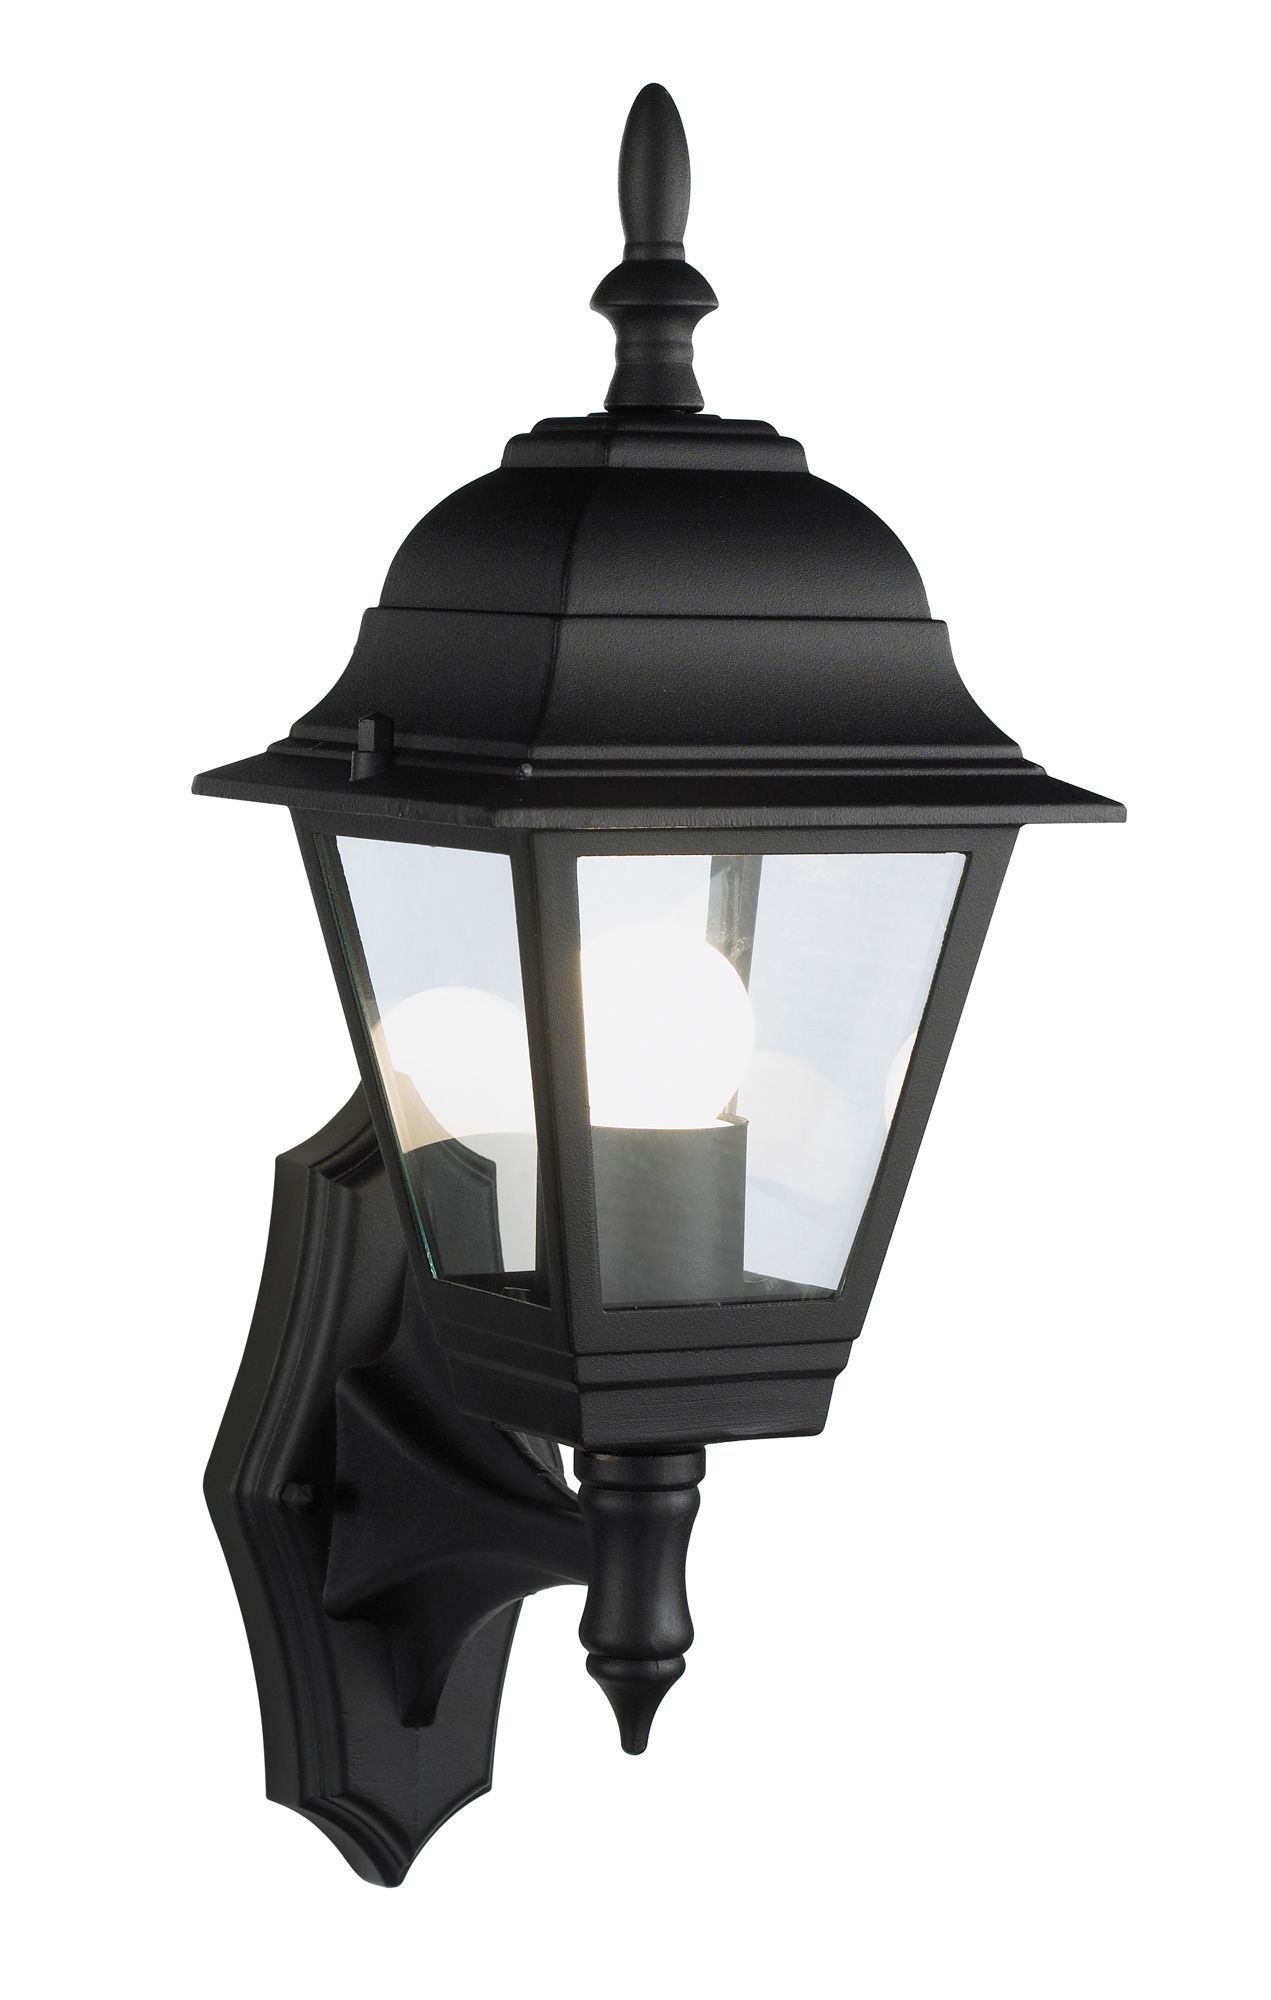 B&Q Penarven Black Mains Powered External Wall Lantern | Departments | DIY  at B&Q